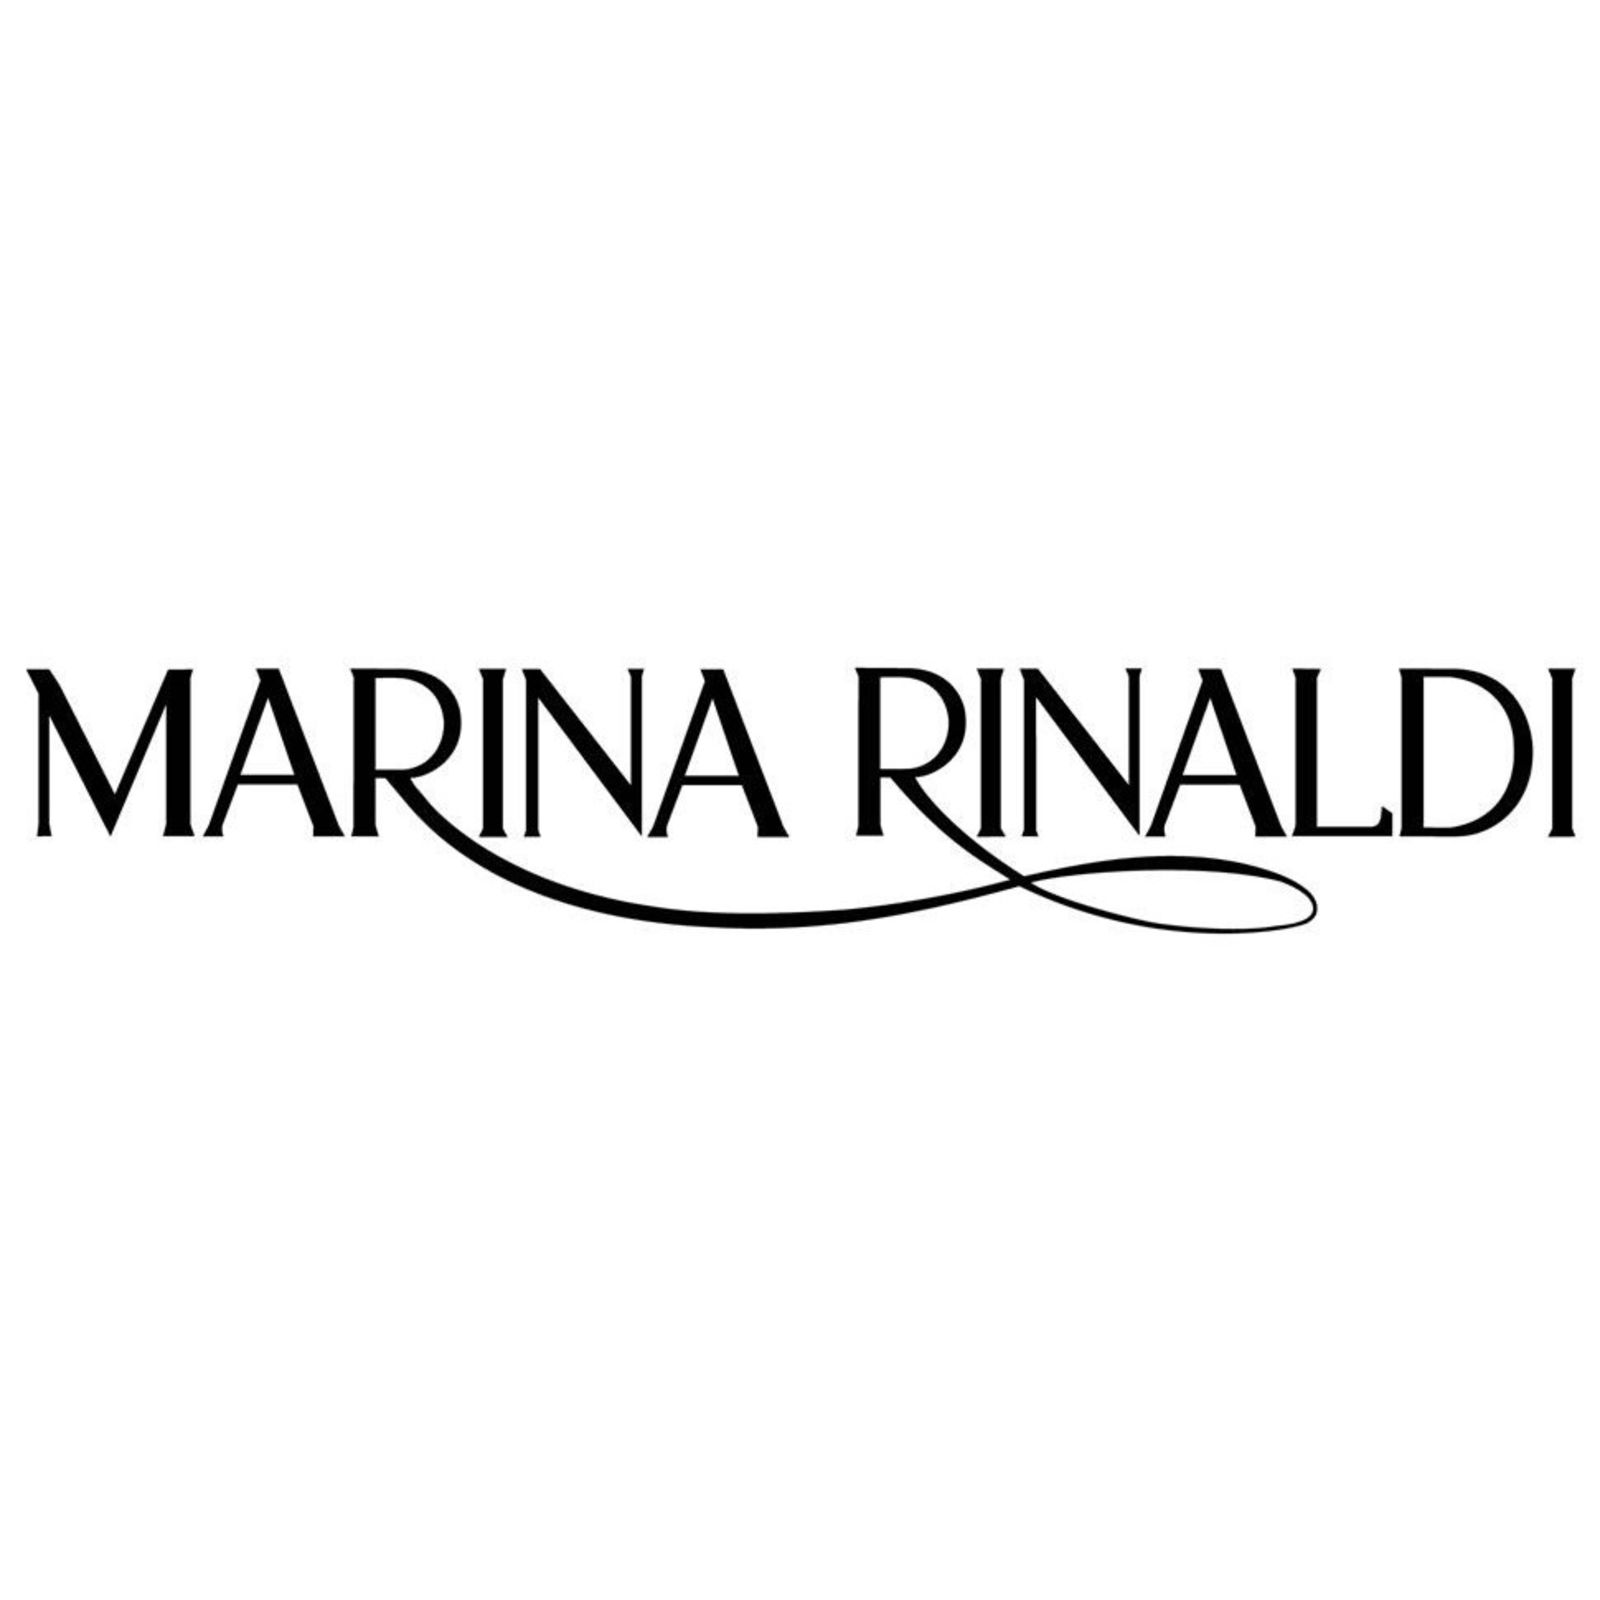 MARINA RINALDI (Изображение 1)